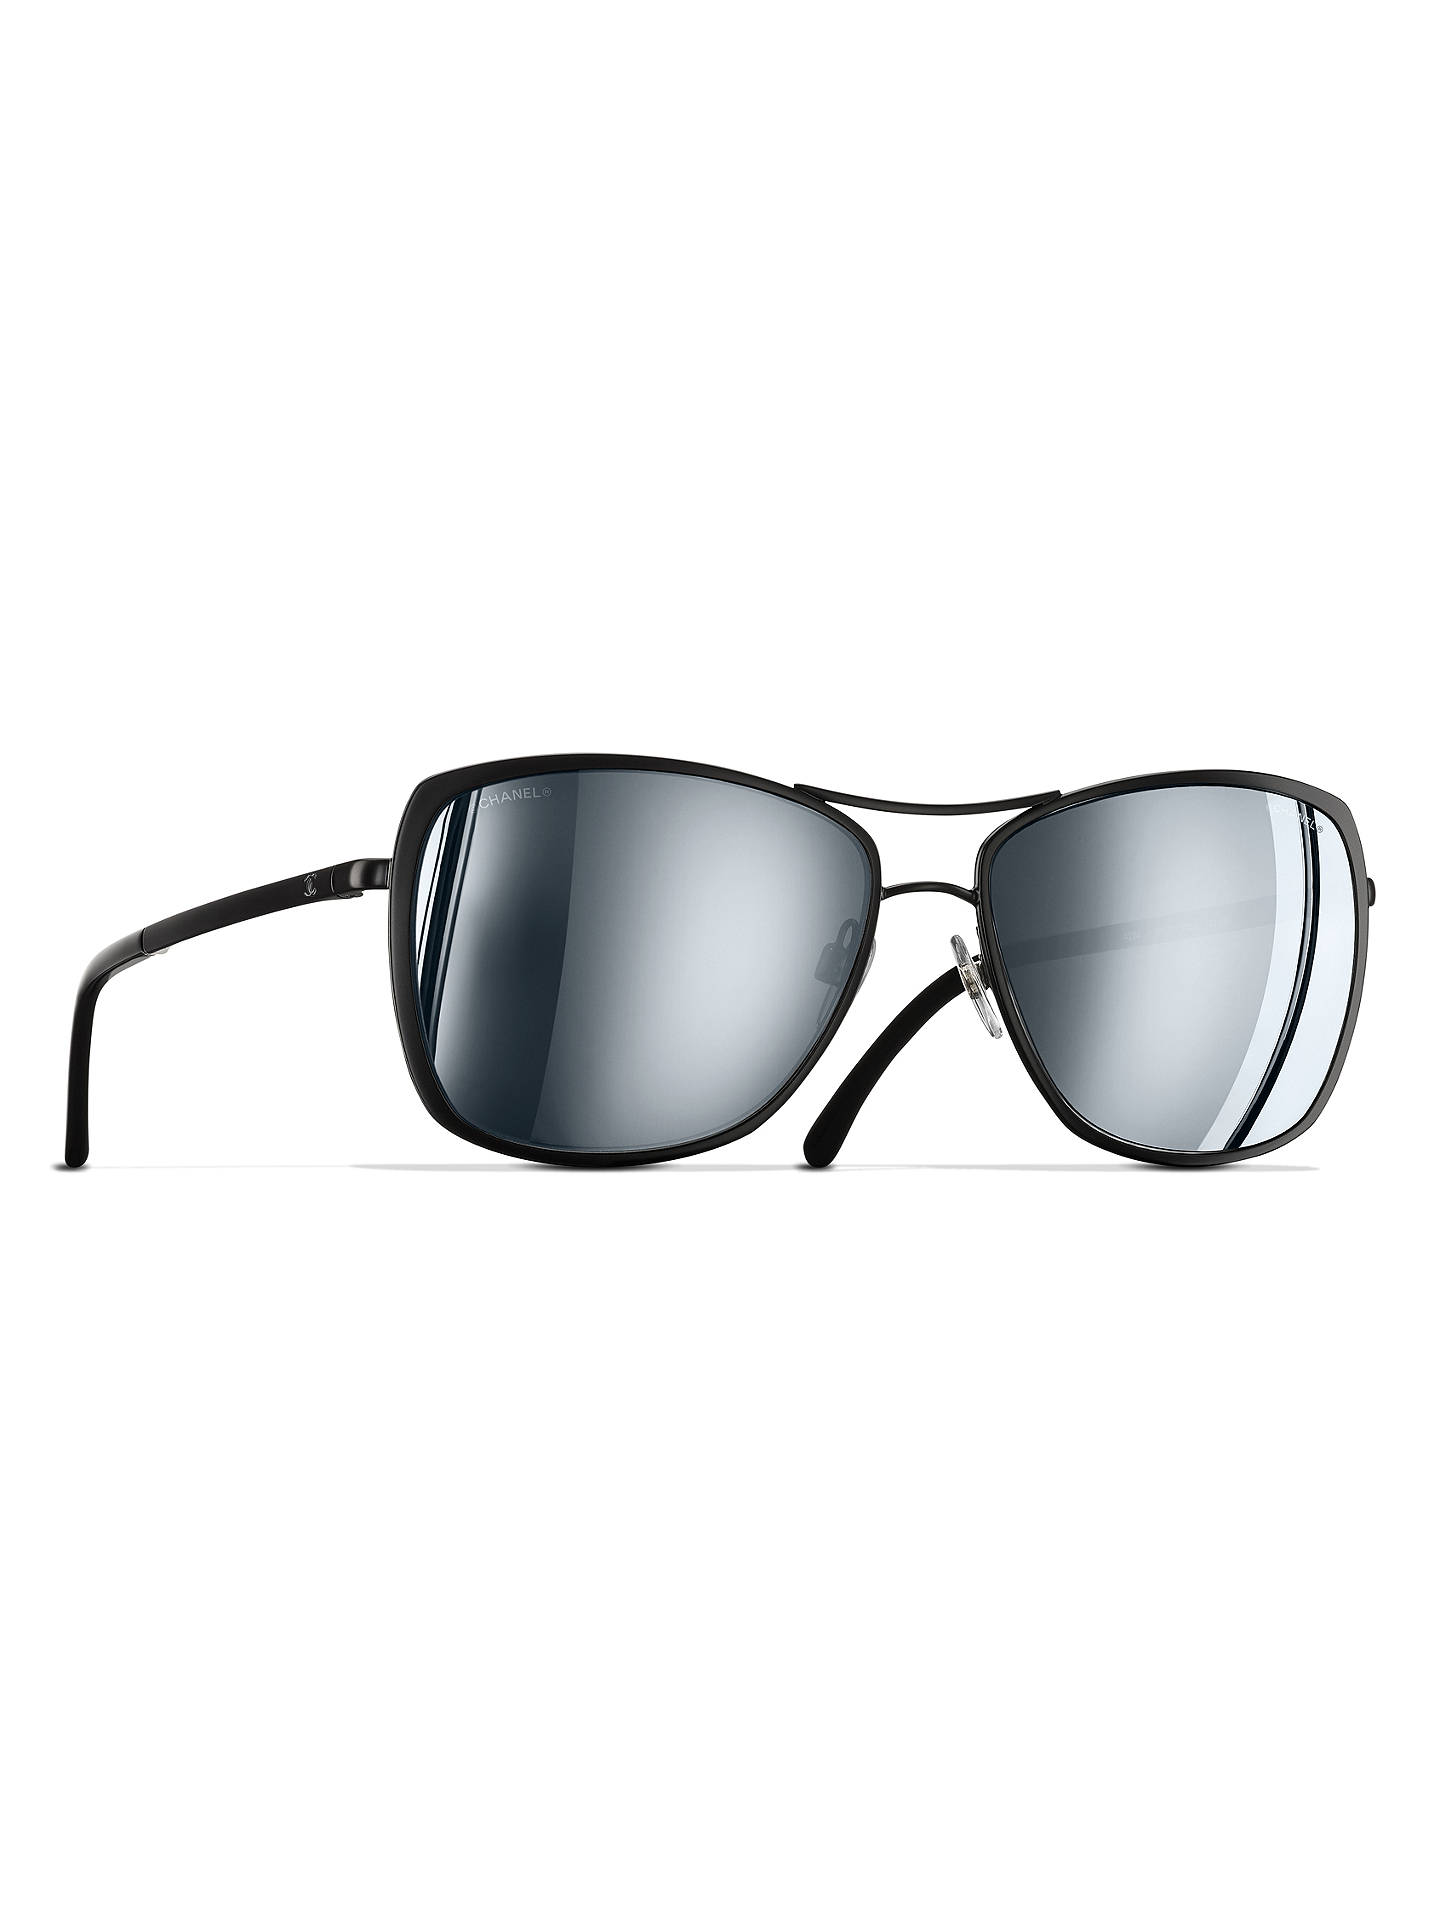 BuyCHANEL Pilot Sunglasses CH4224 Black Online at johnlewis.com ... 43bdee0ccd6